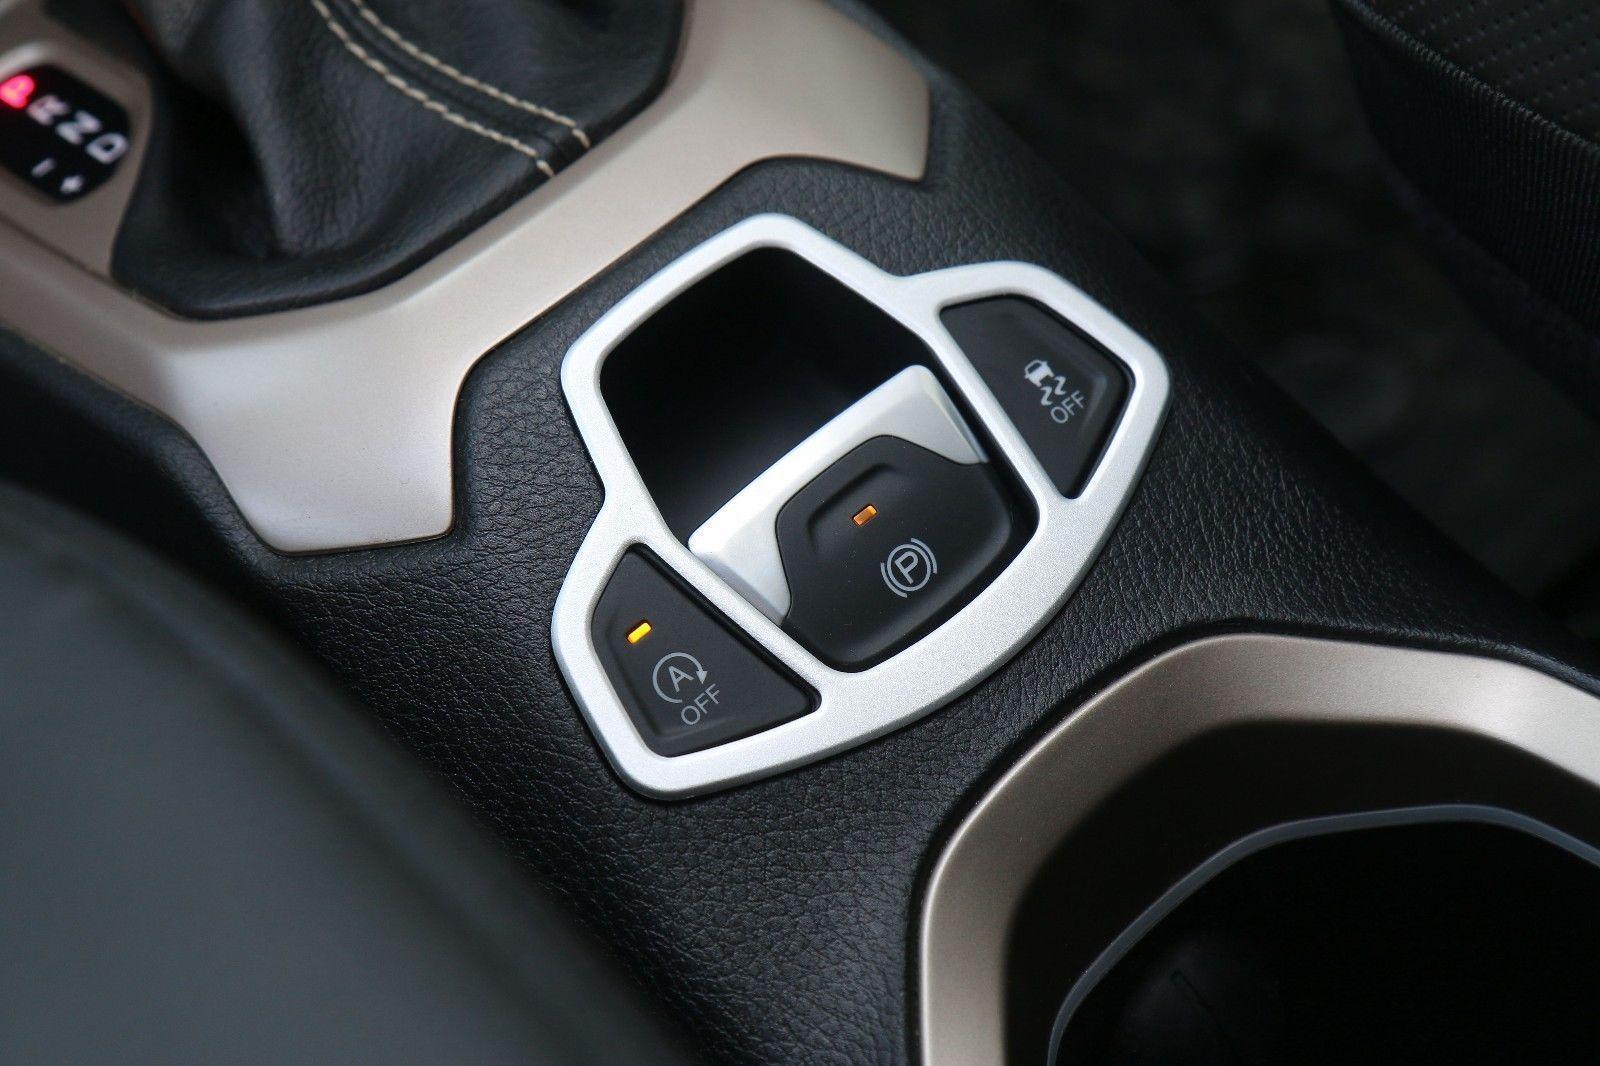 Electronic handbrake decorative frame Cover Trim for Jeep Renegade 15-16